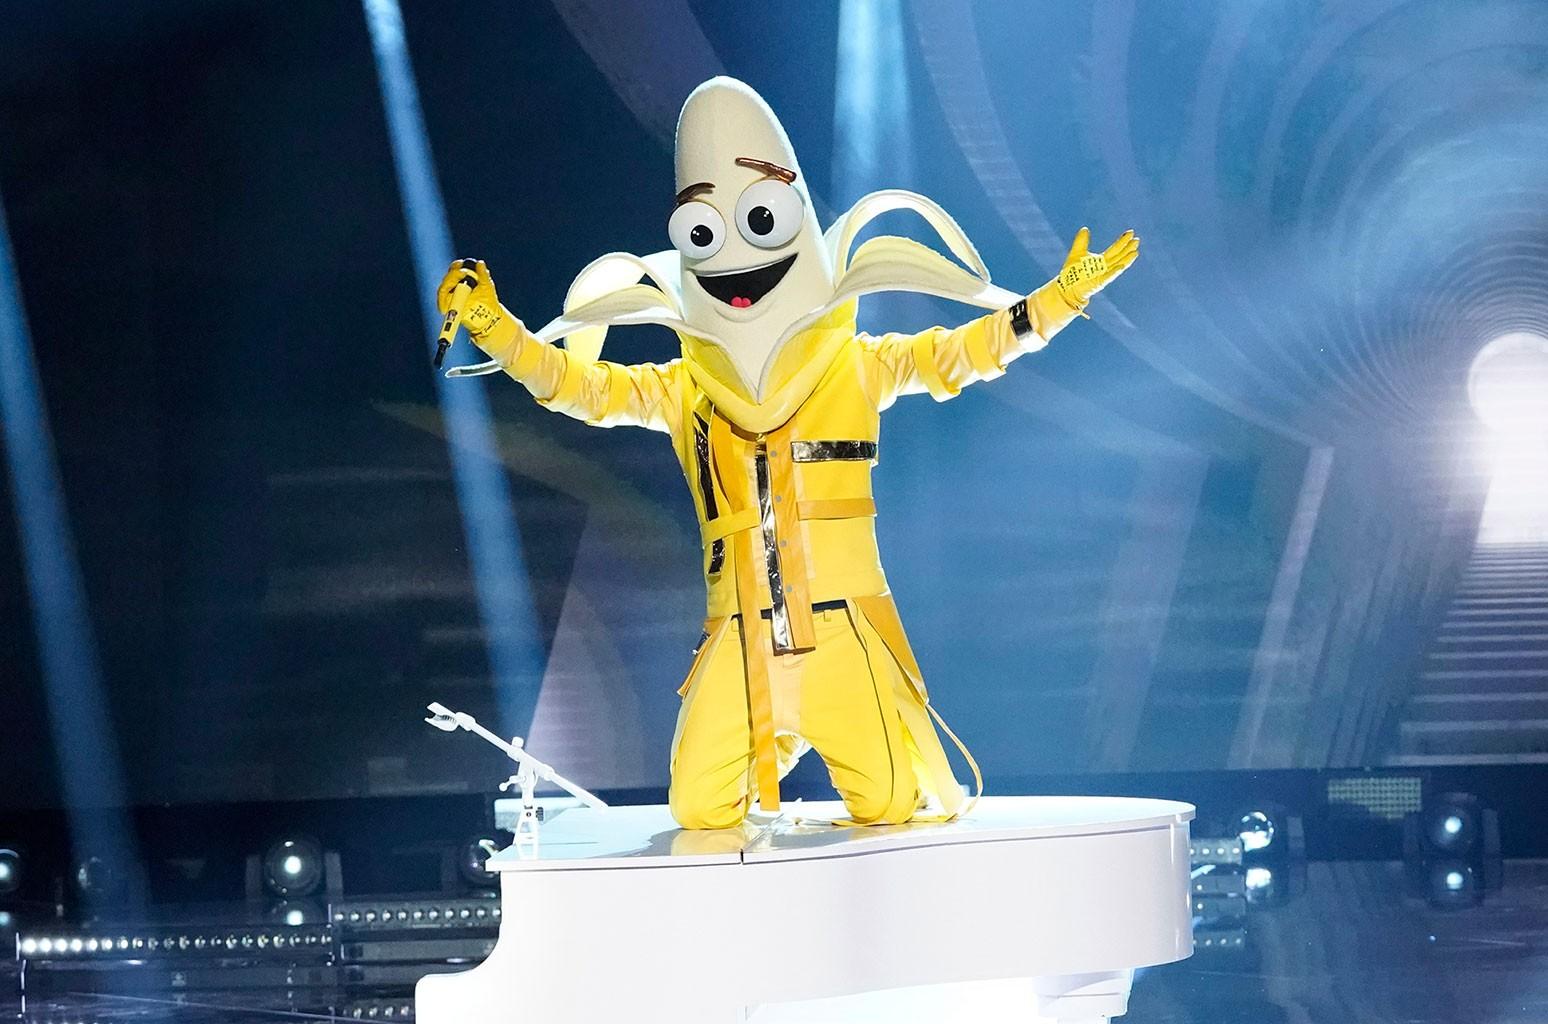 The Banana masked singer